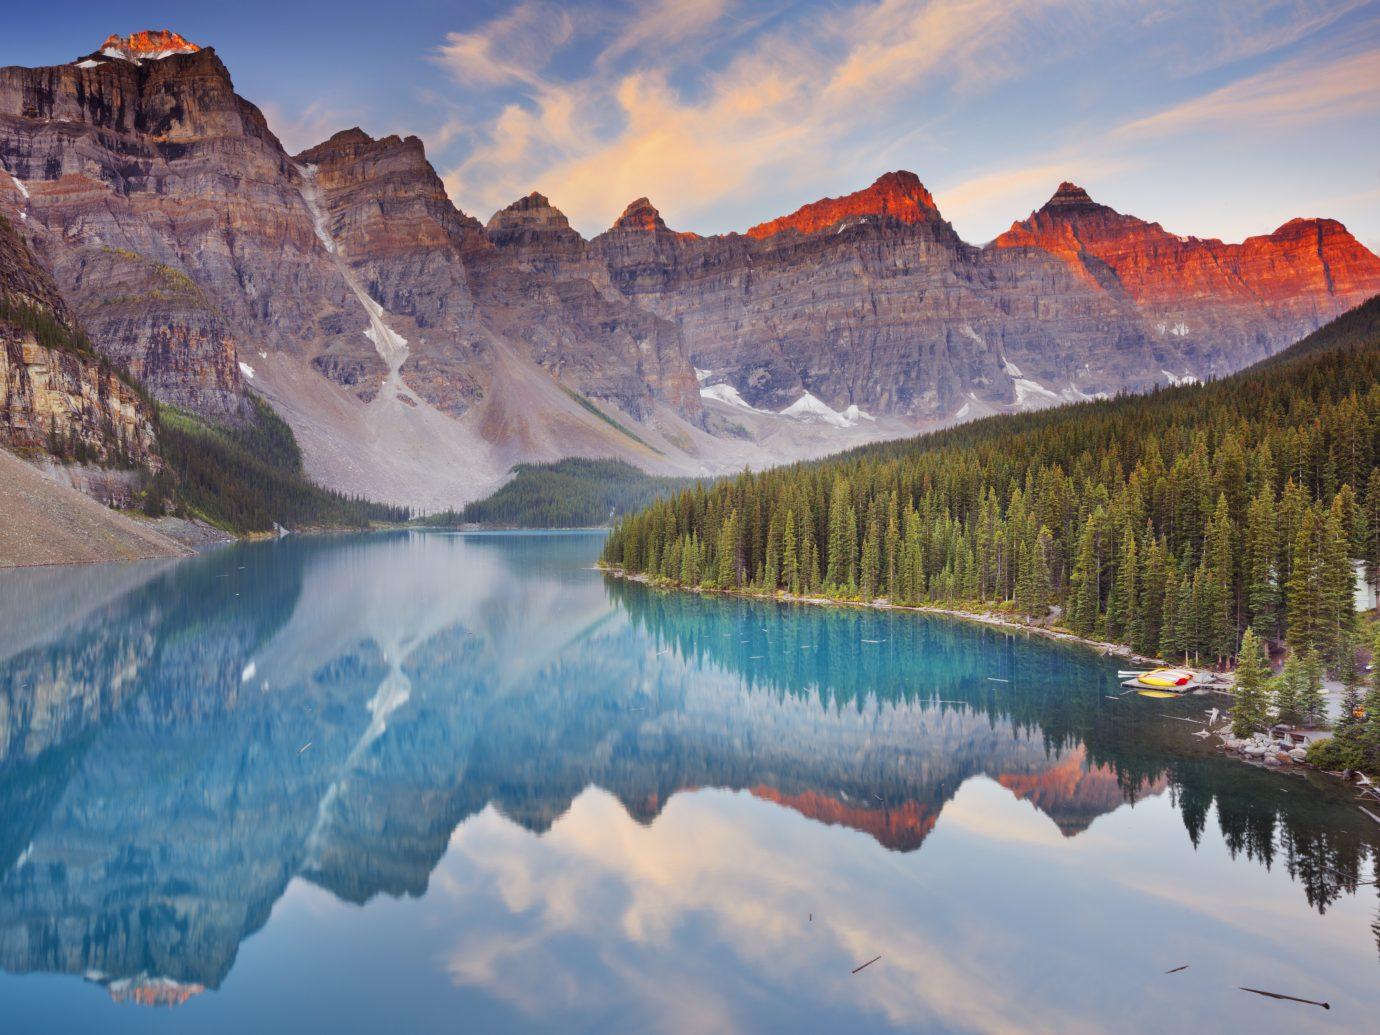 Beautiful Moraine Lake in Banff National Park, Canada